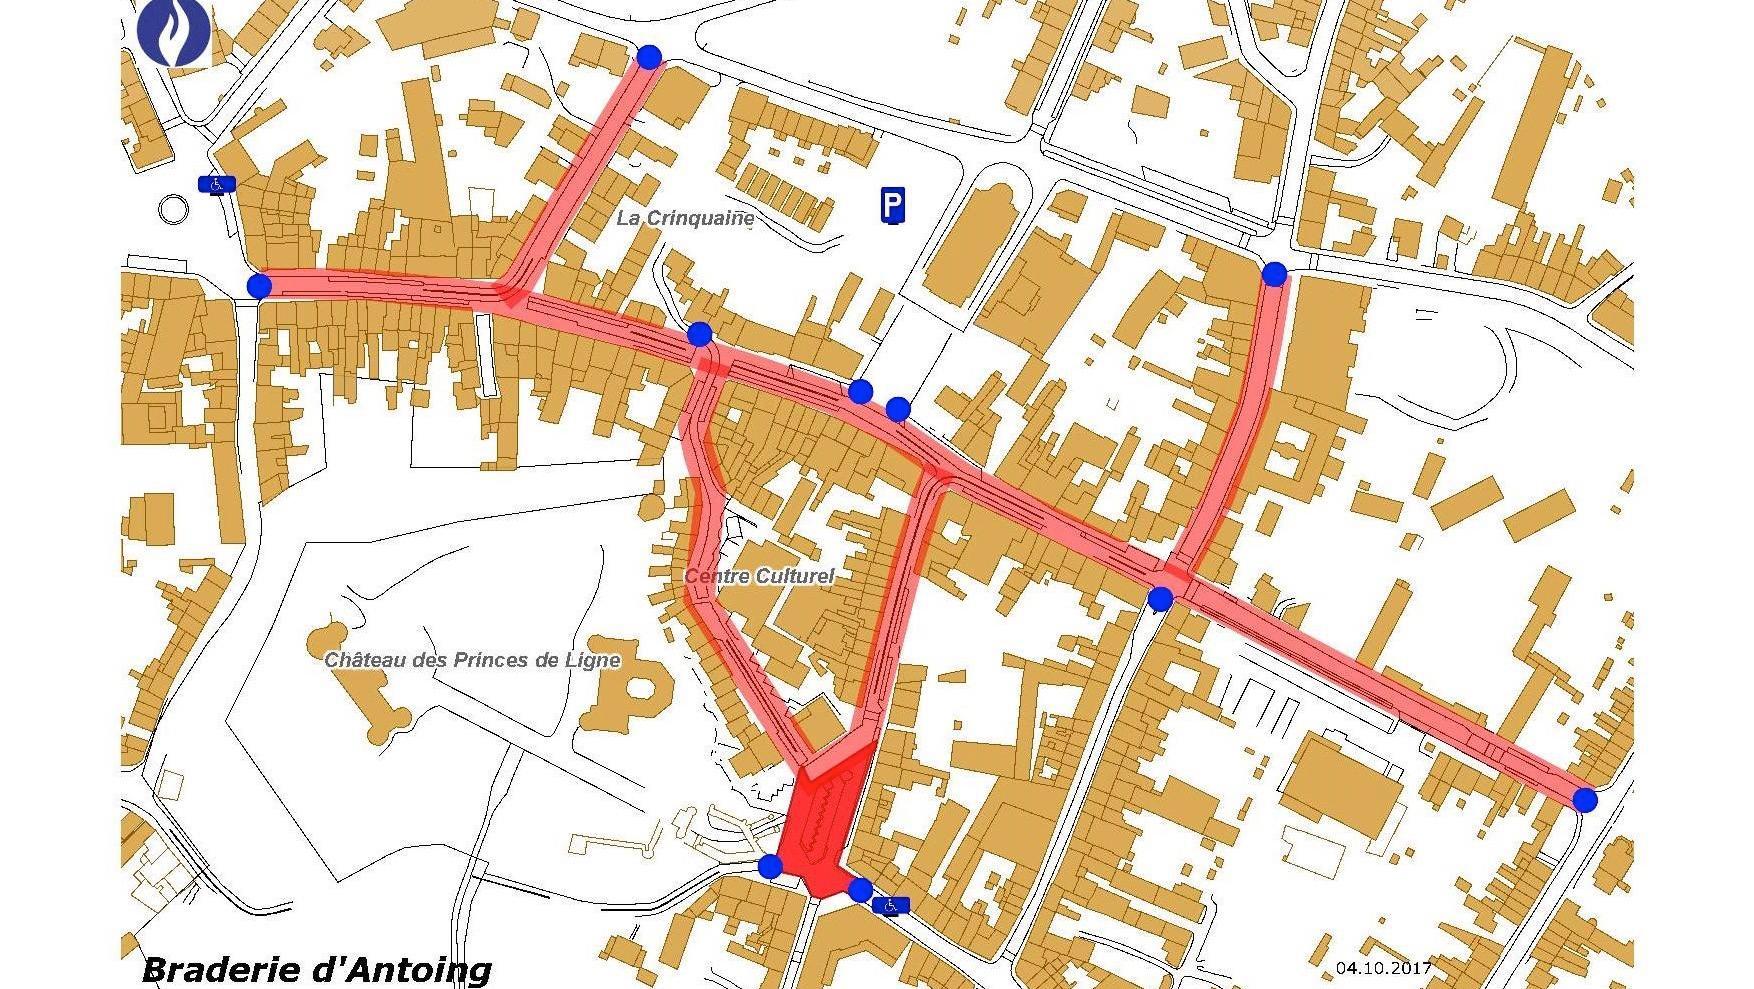 Braderie d'Antoing : le coeur de la ville sera interdit à la circulation